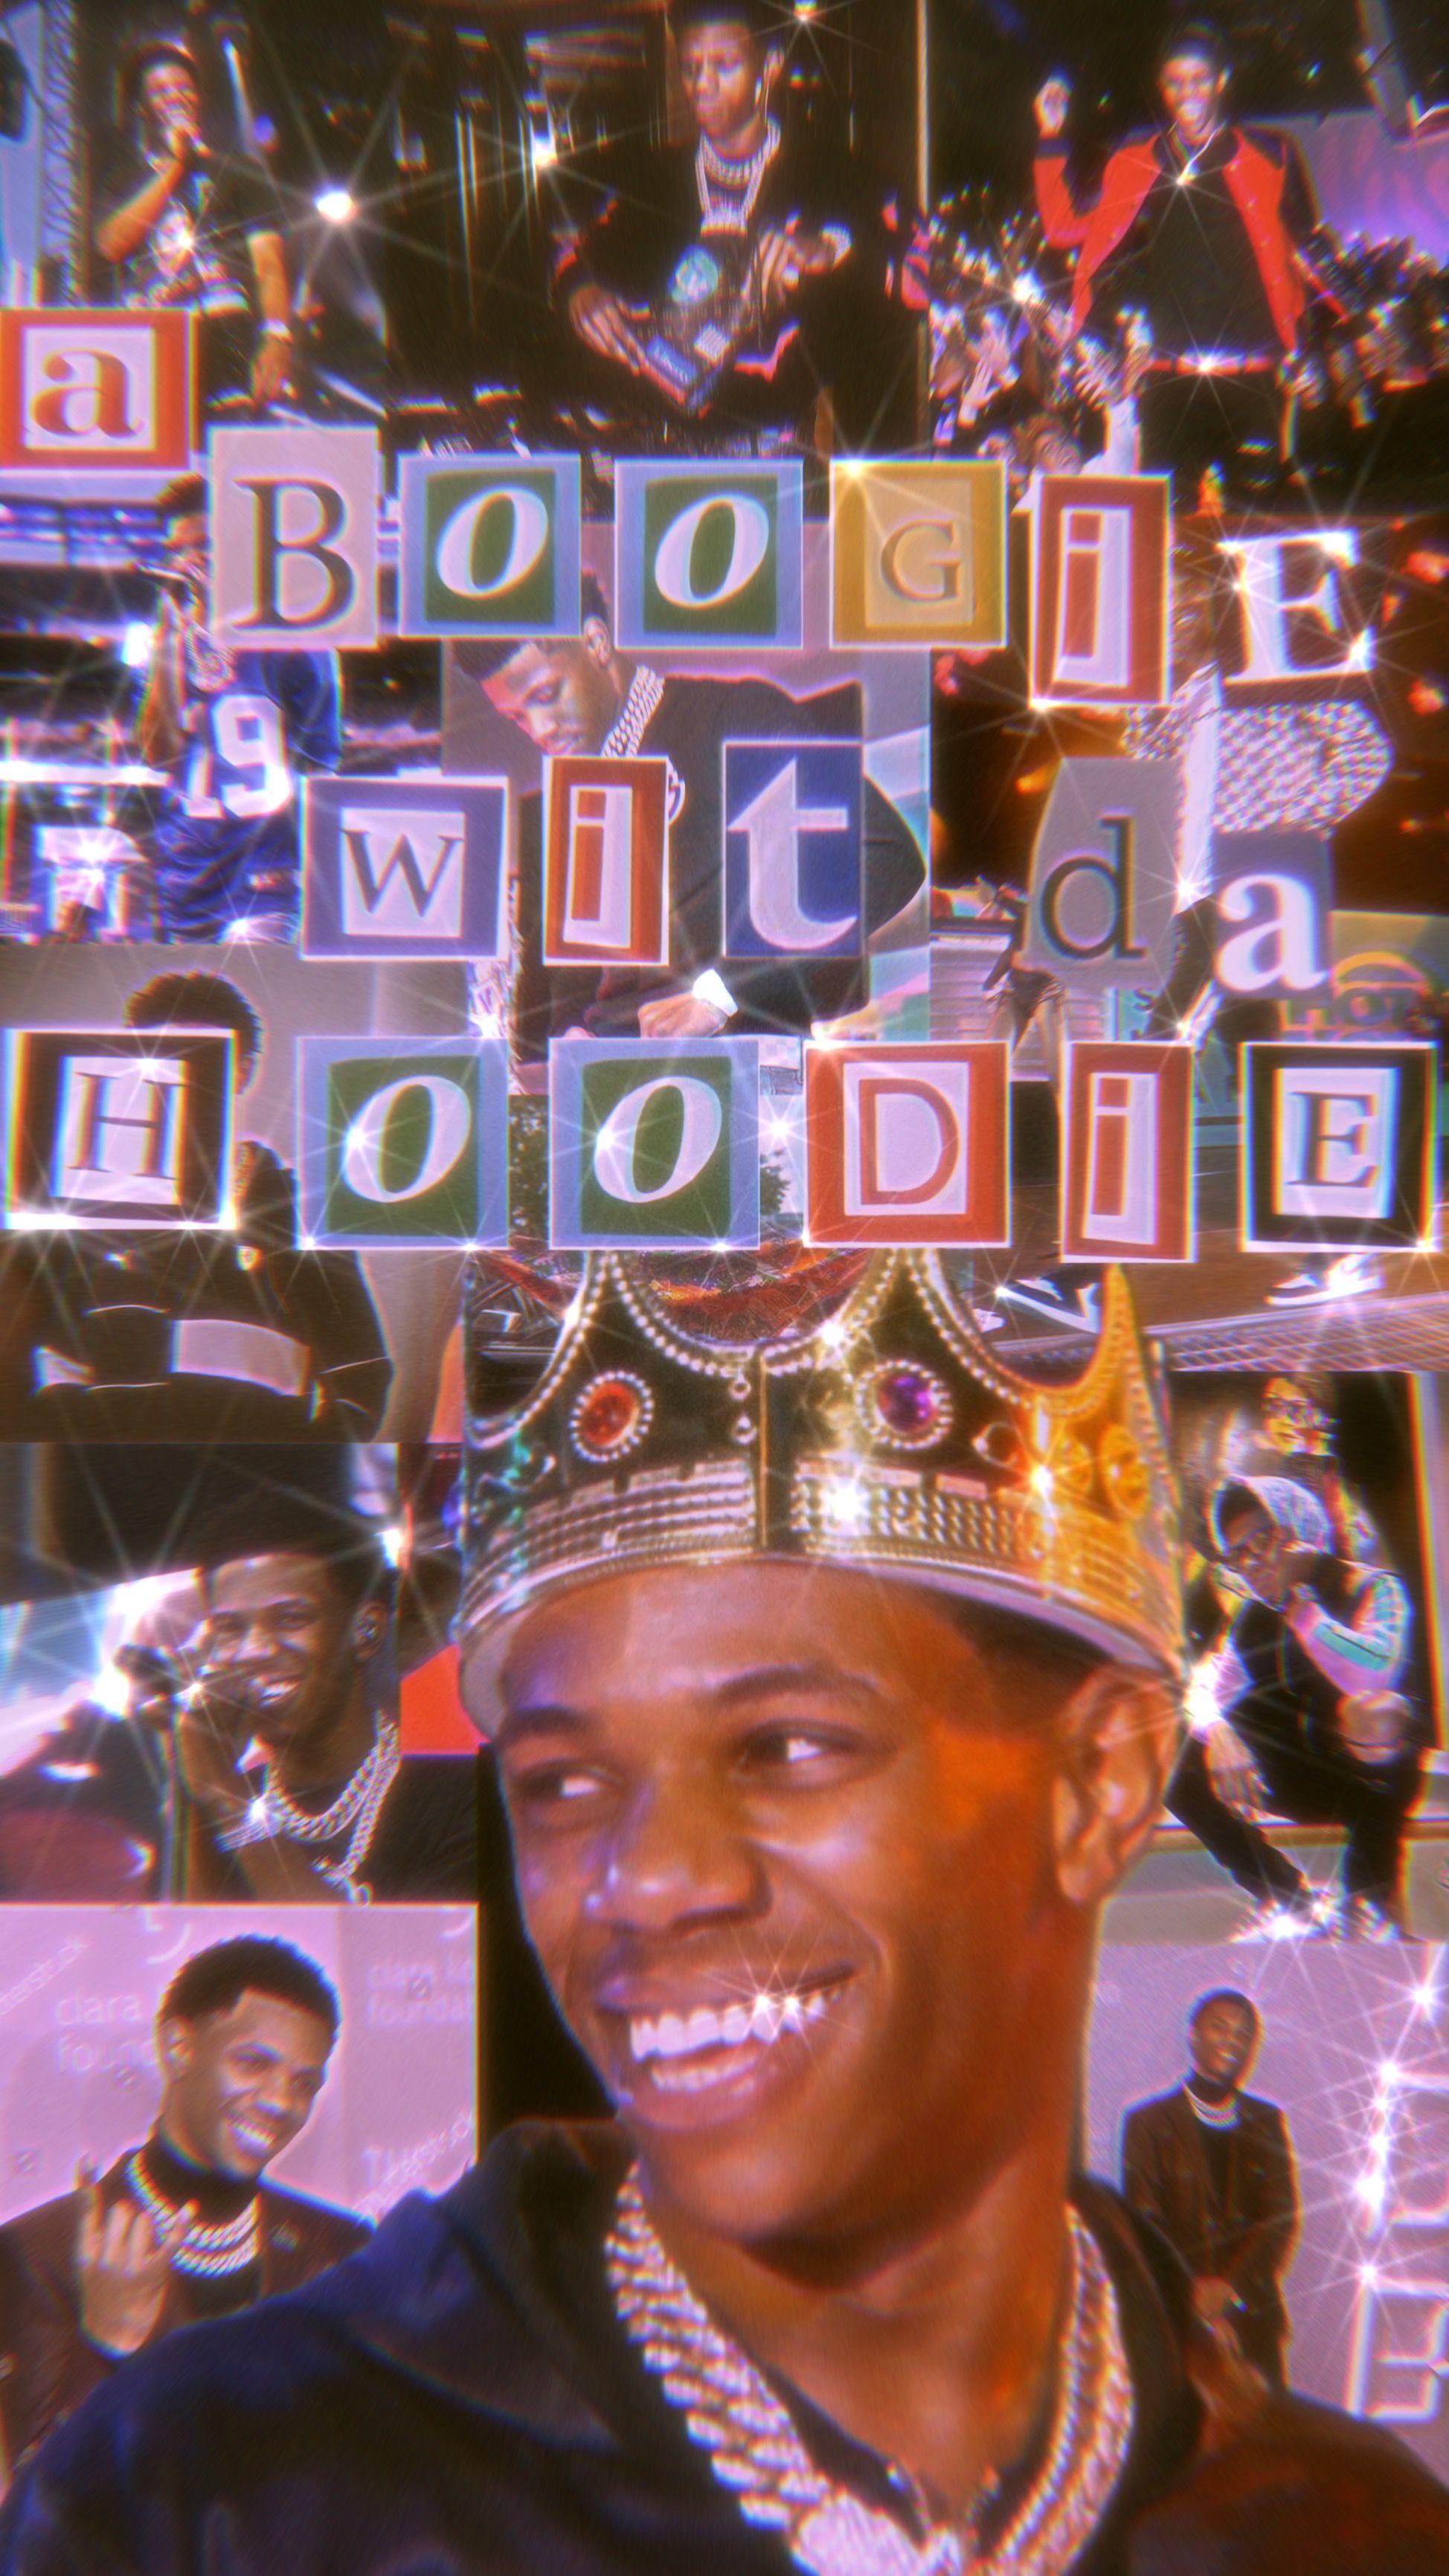 A Boogie Wit Da Hoodie Iphone Wallpaper Music Rapper Wallpaper Iphone Hypebeast Wallpaper